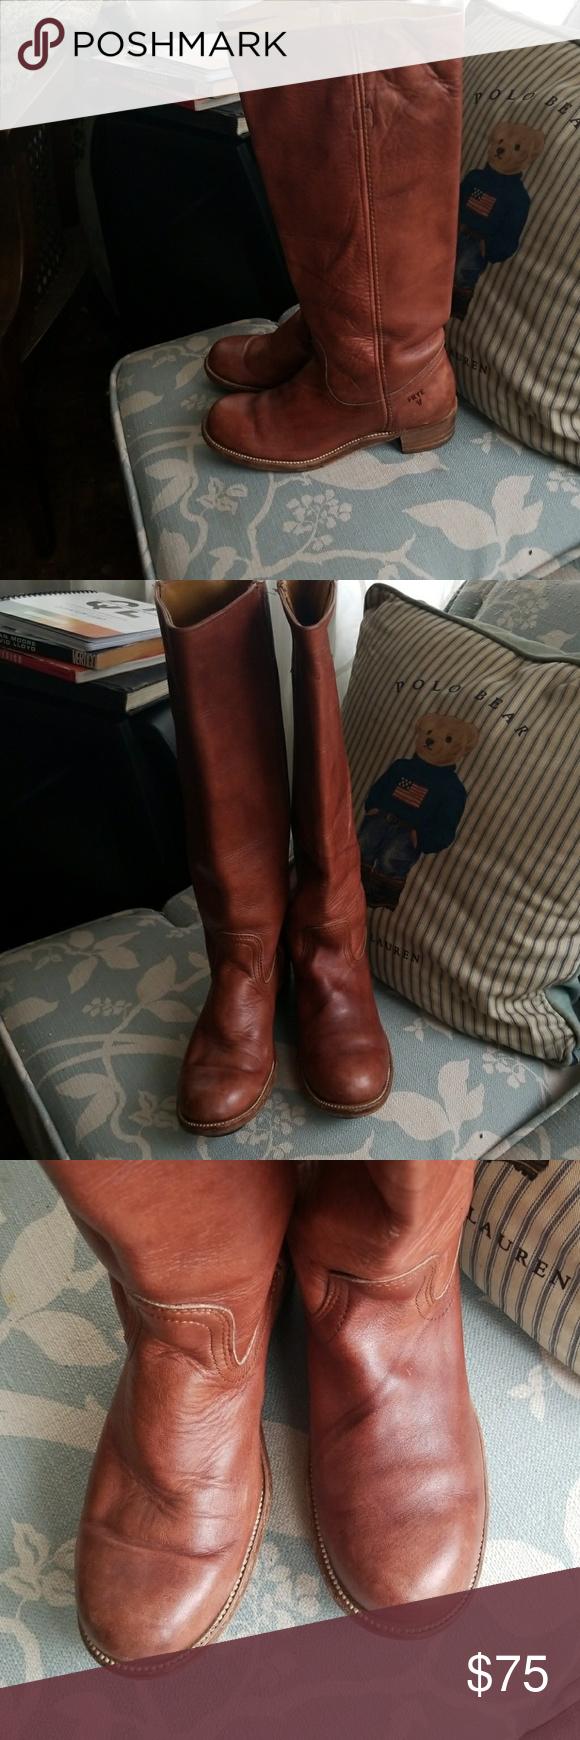 Frye boots Frye boots, Boots, Frye